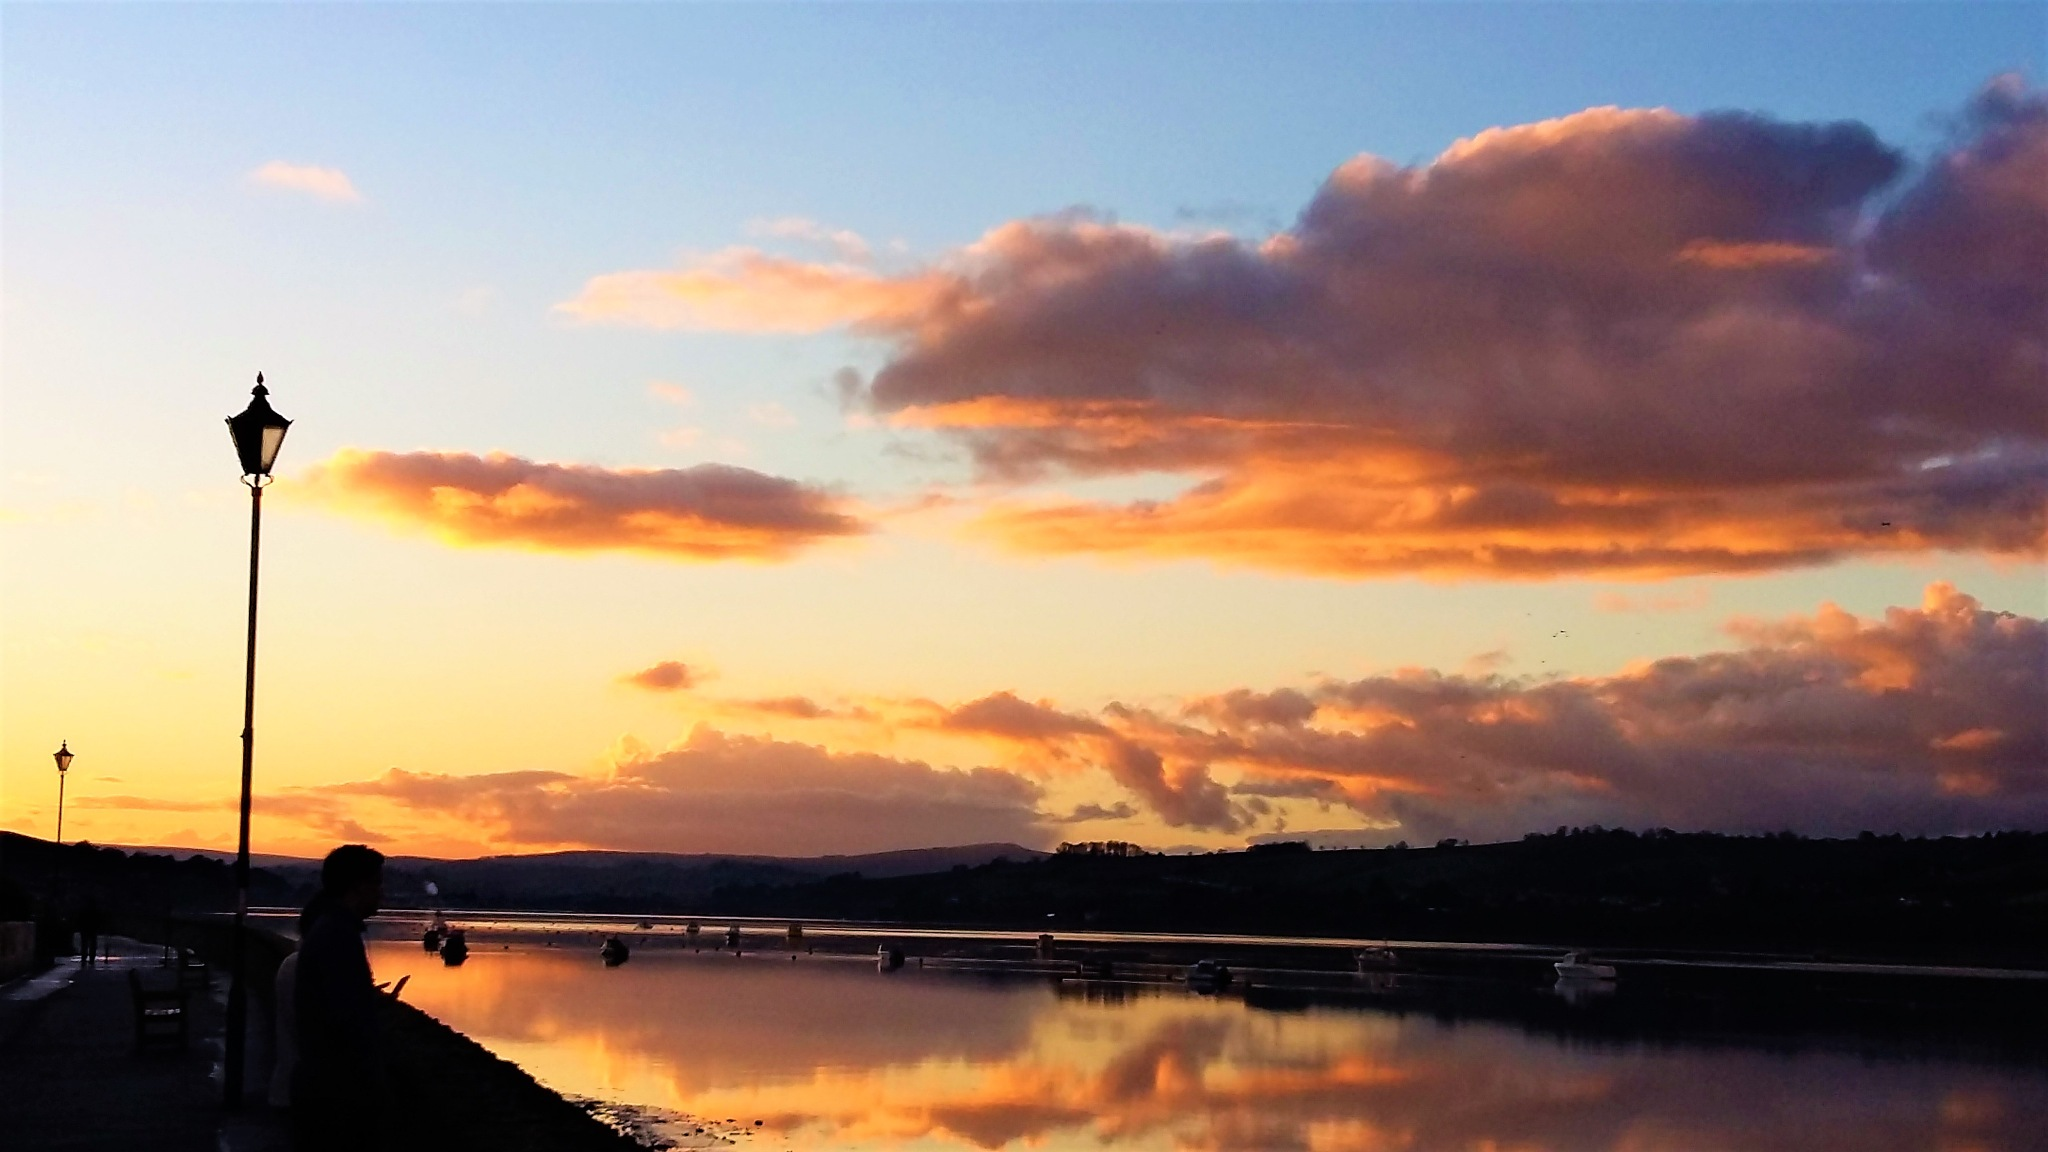 Sunset over the Teign Estuary by Sandra Wright